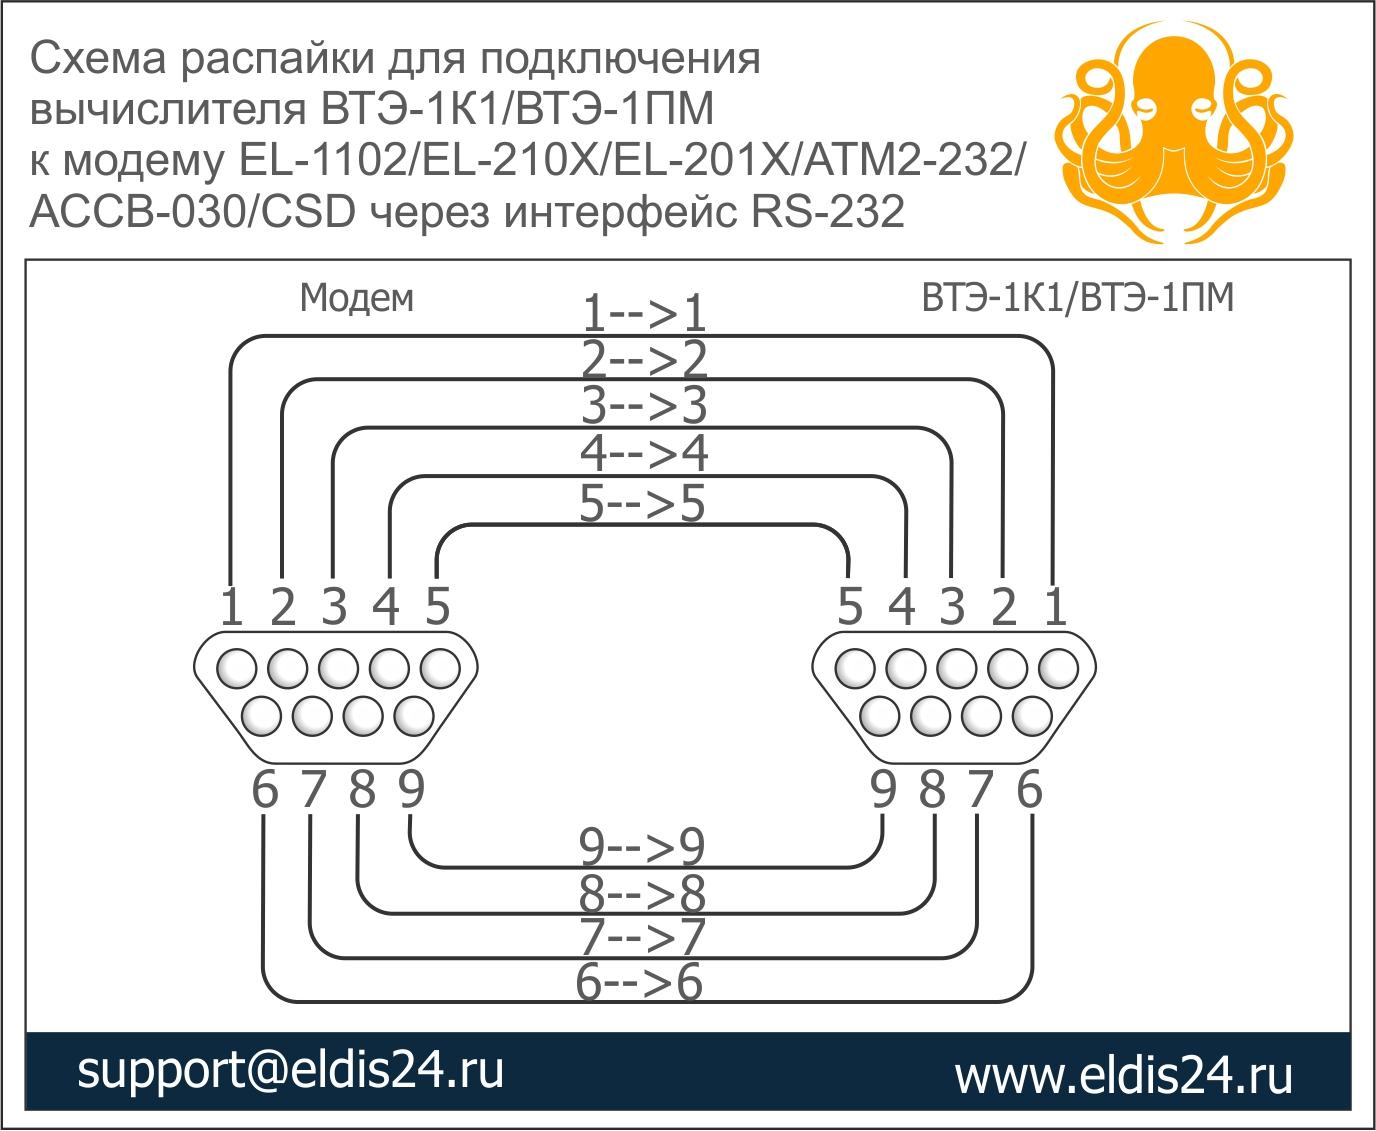 9cb08536e54d851407bcc93e736d0dce.jpg